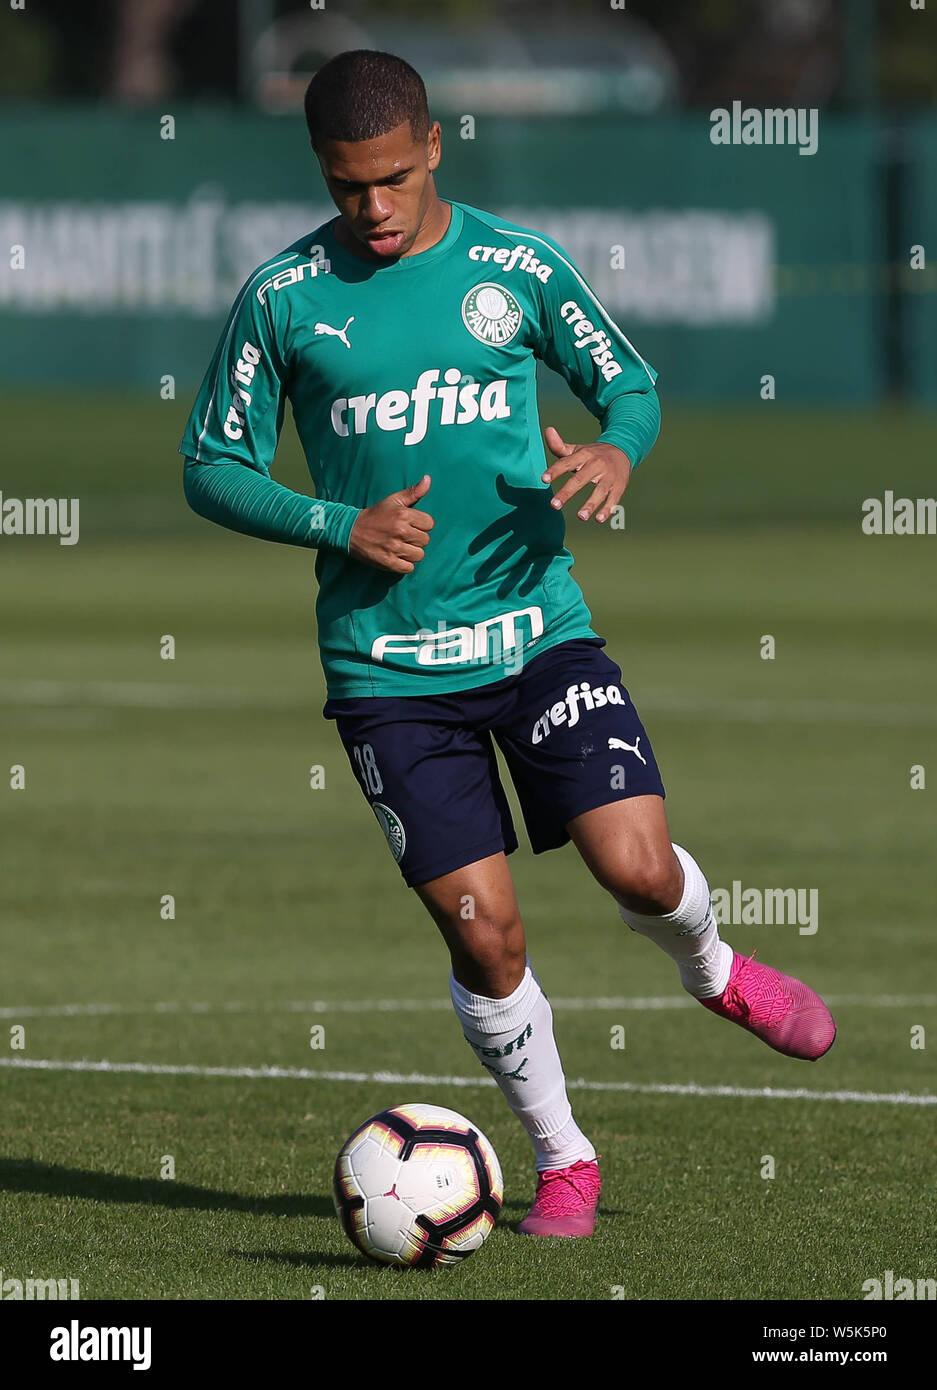 Sao Paulo Sp 29 07 2019 Treino Do Palmeiras Lucas Esteves From Se Palmeiras During Training At The Football Academy Photo Cesar Greco Fotoarena Stock Photo Alamy